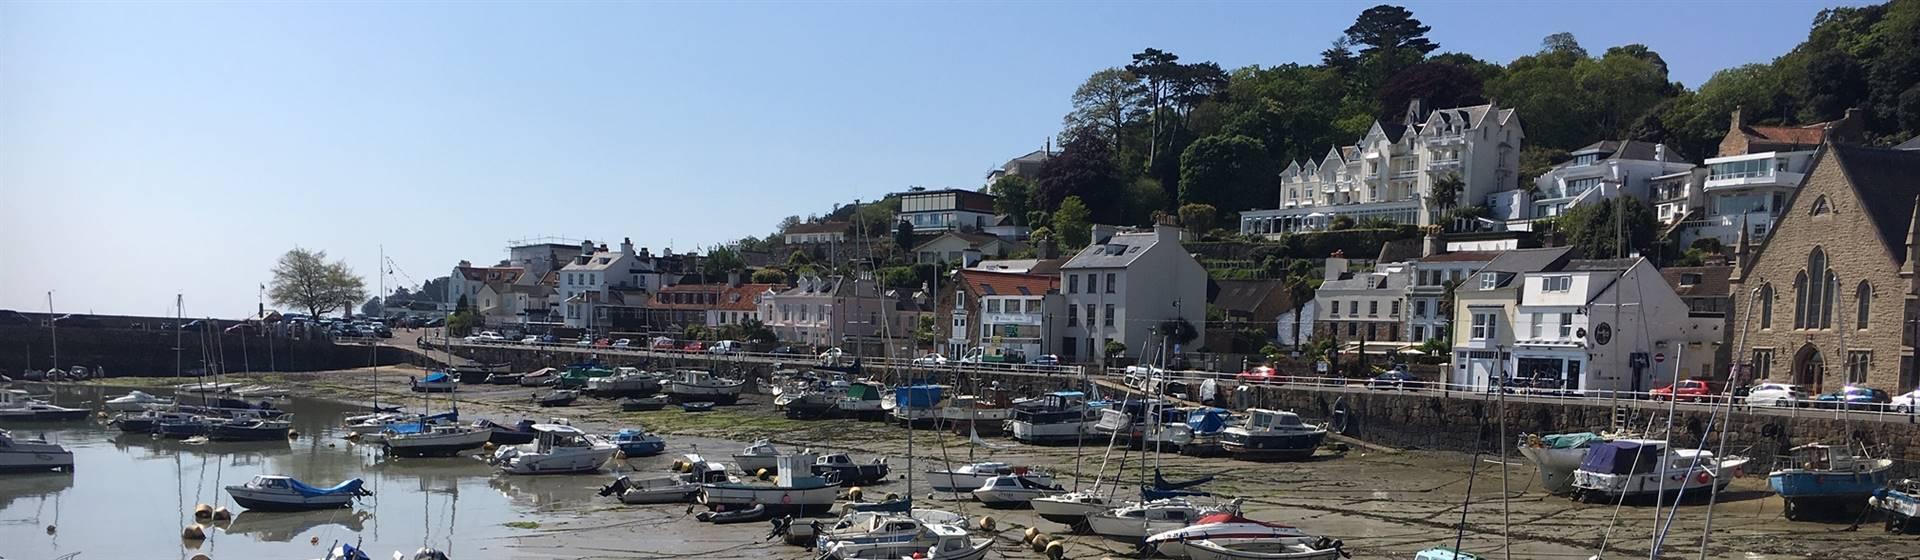 Britains Sunshine Isle - Jersey By Air - DBB